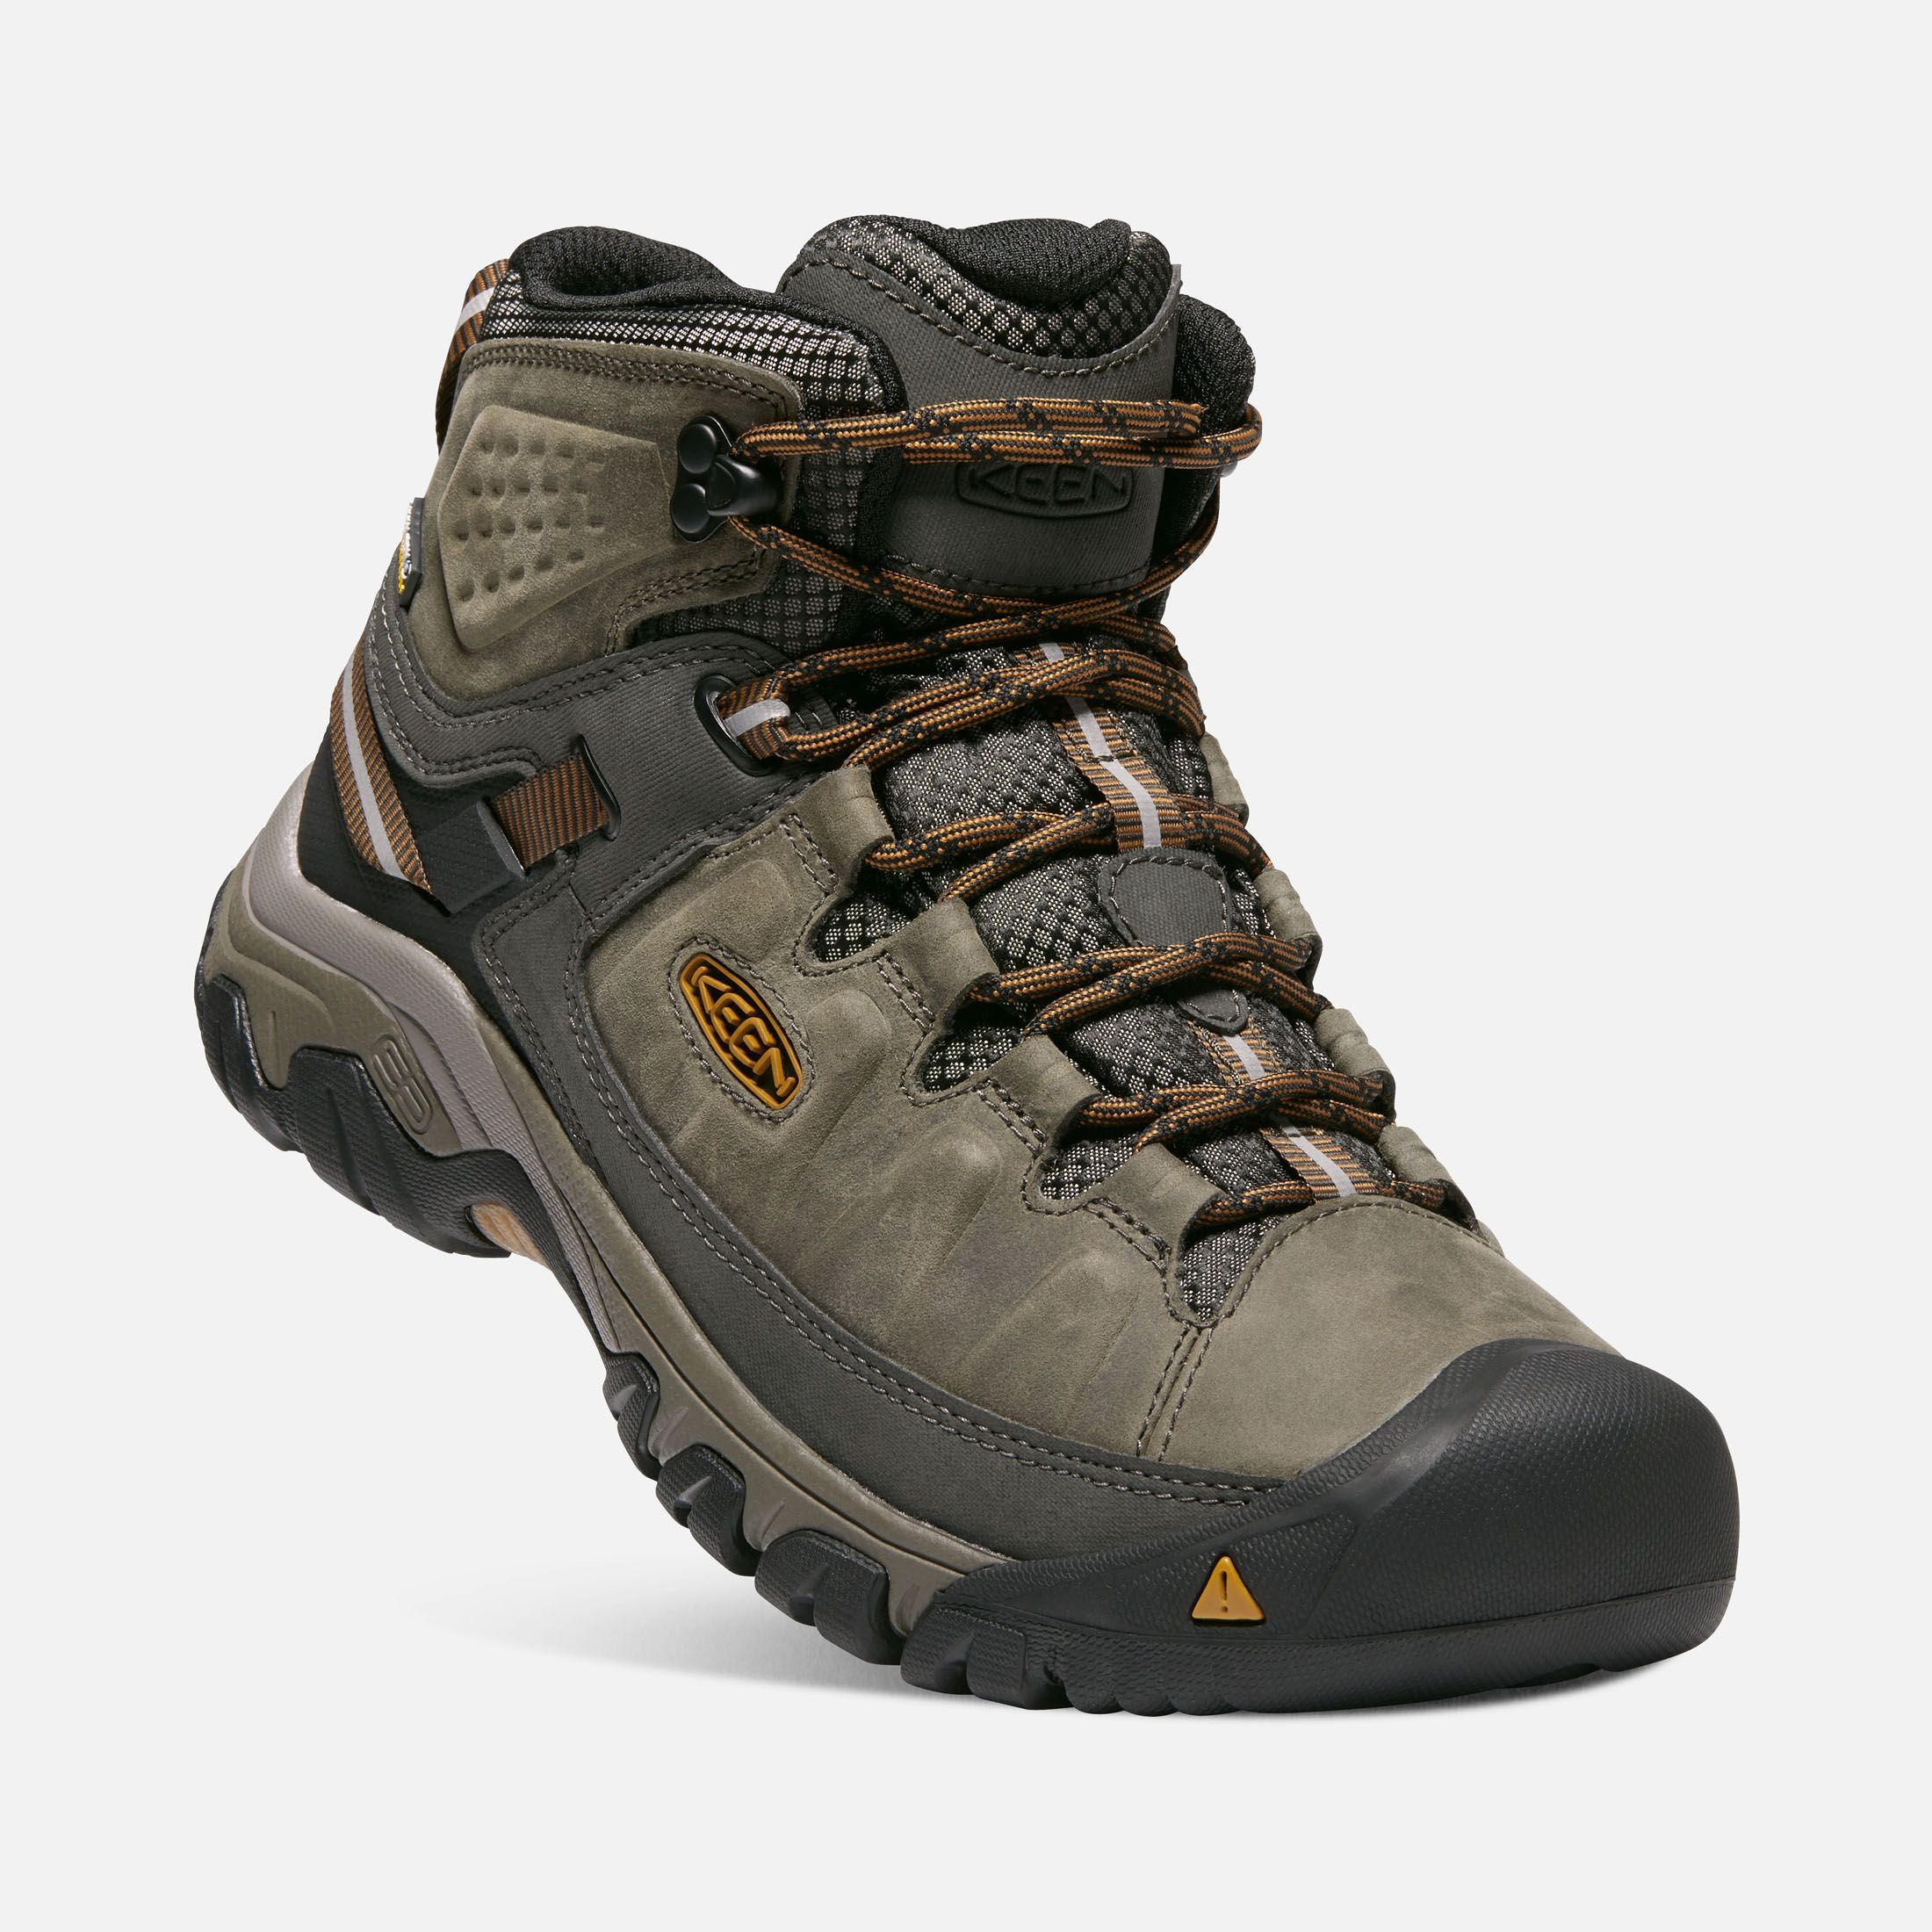 Keen Men S Waterproof Hiking Boots Targhee Iii Mid 8 5 Black